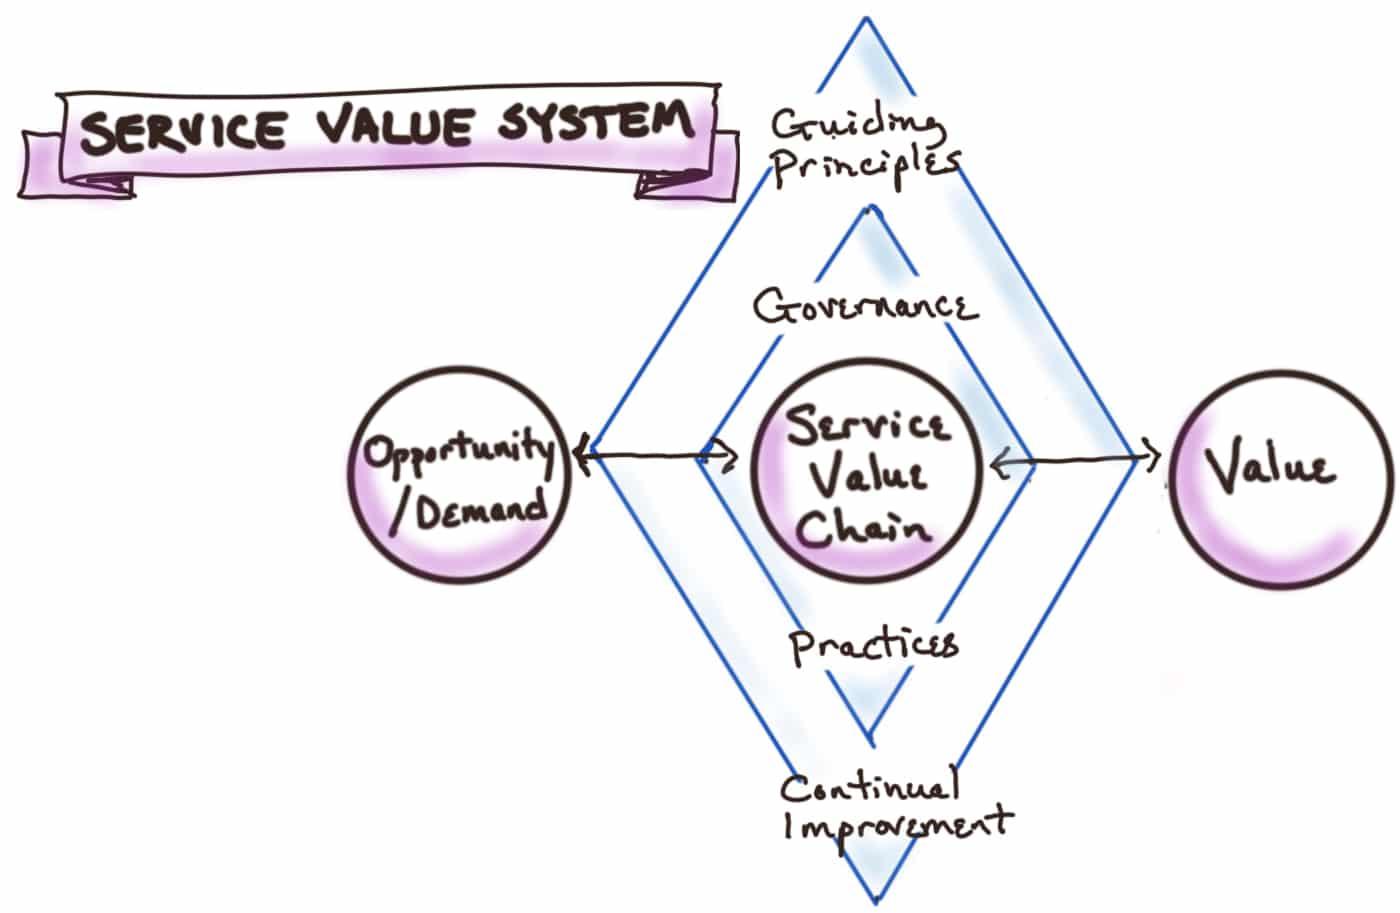 Service Value System